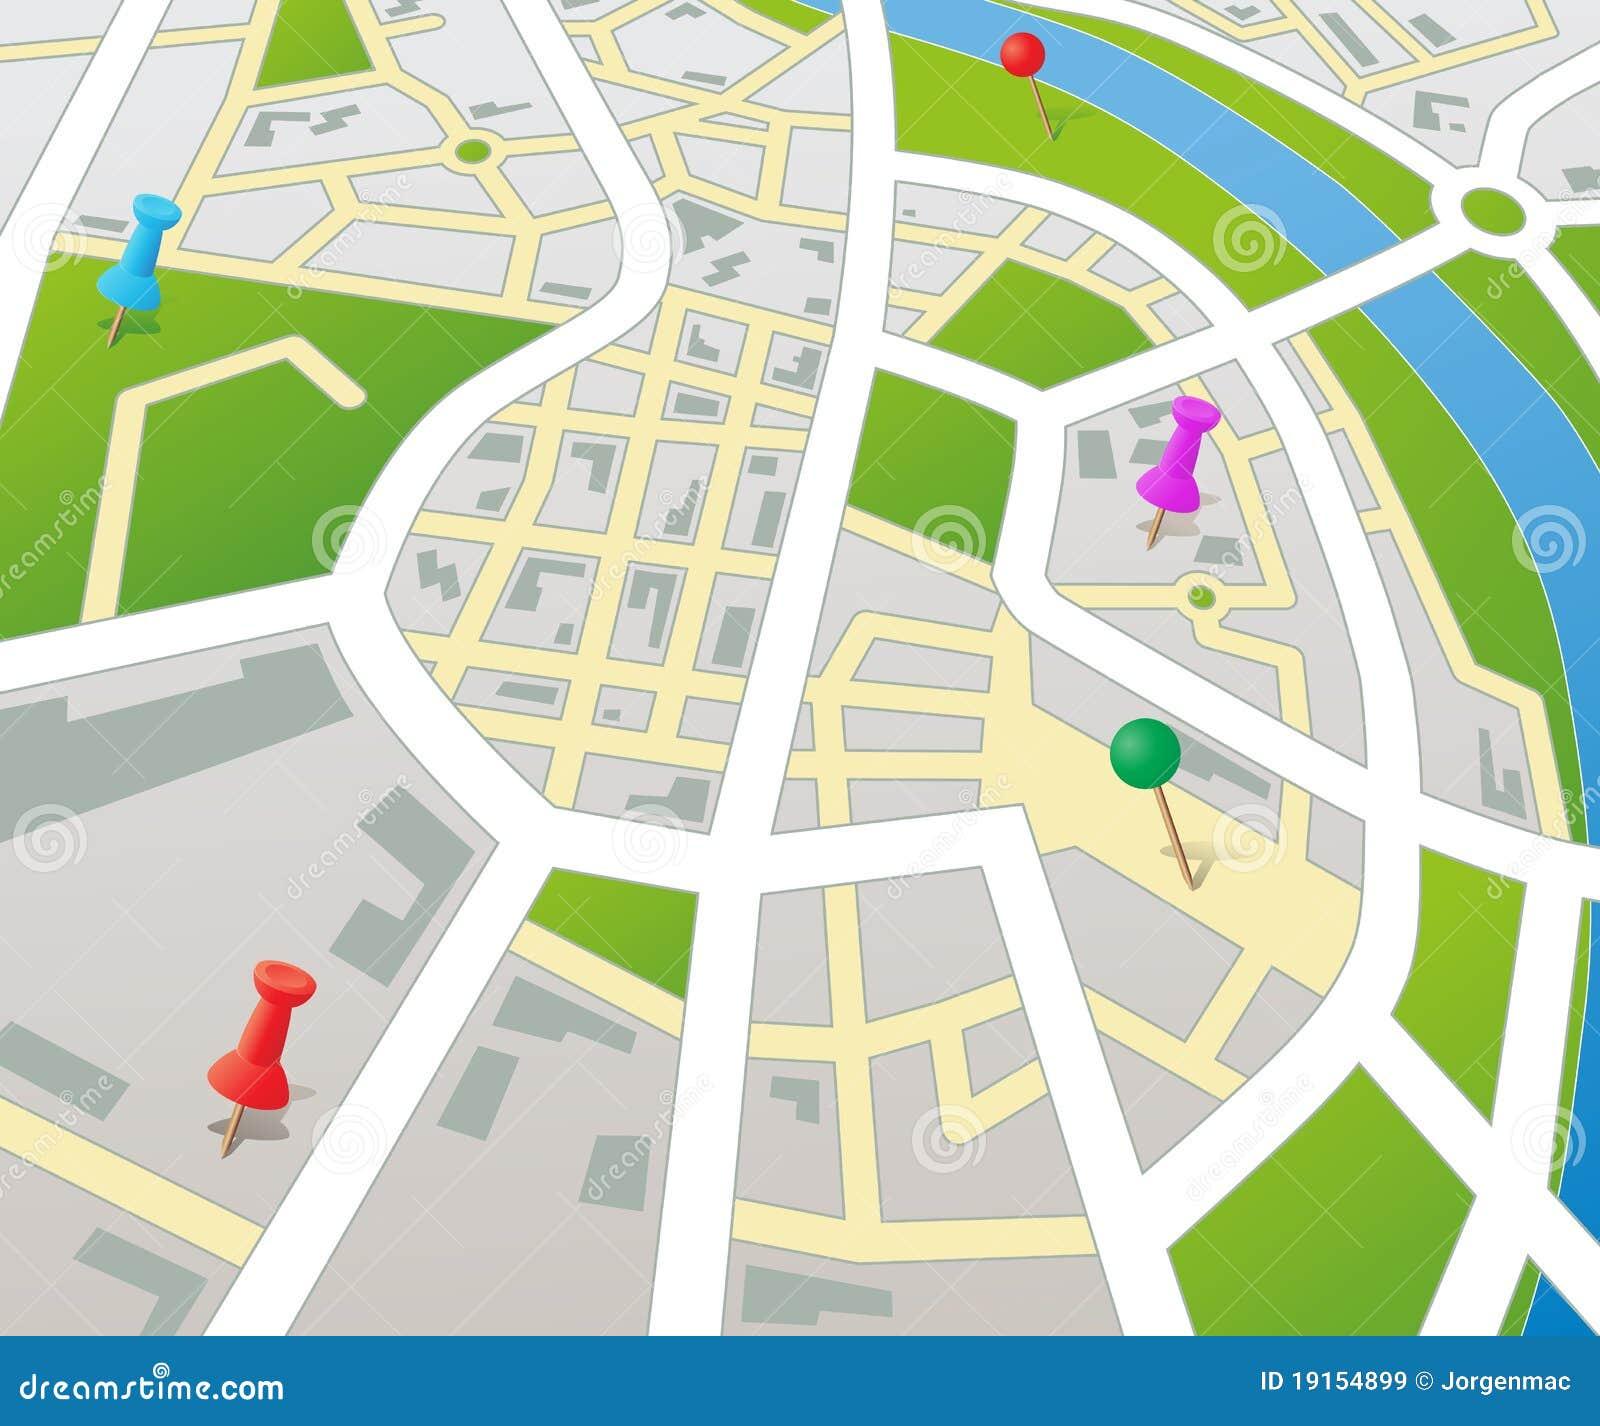 Template Plan De Ville